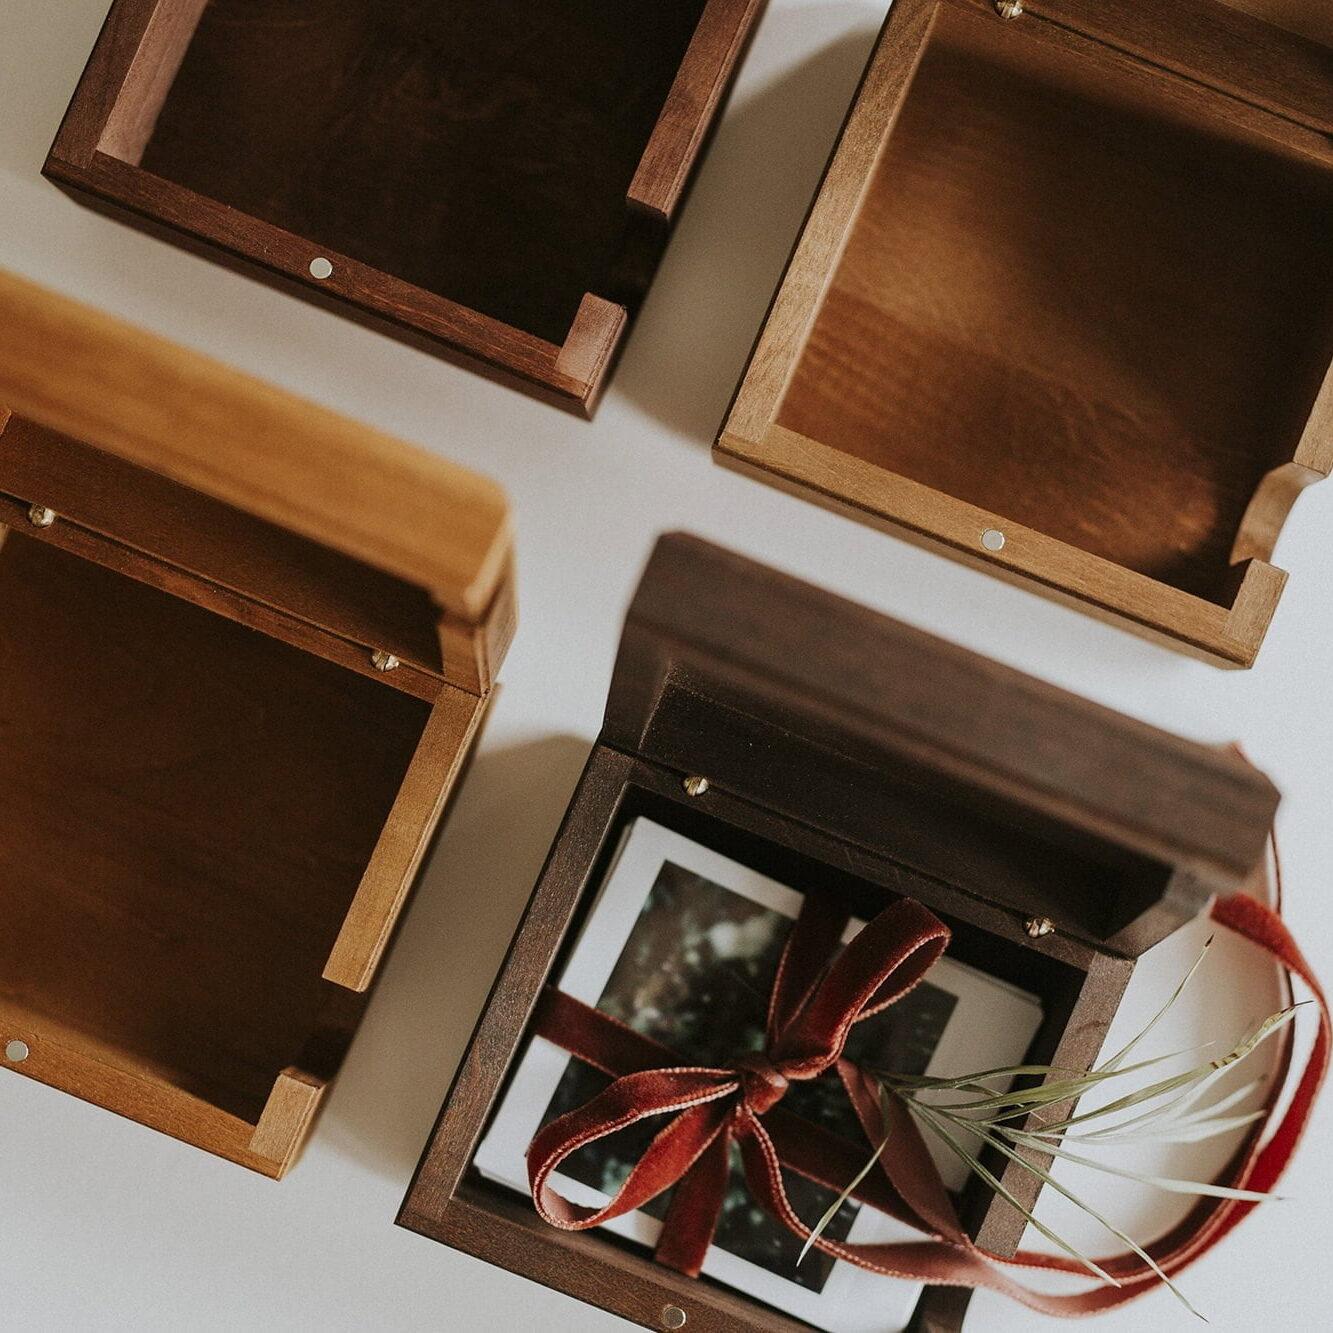 instax prints box